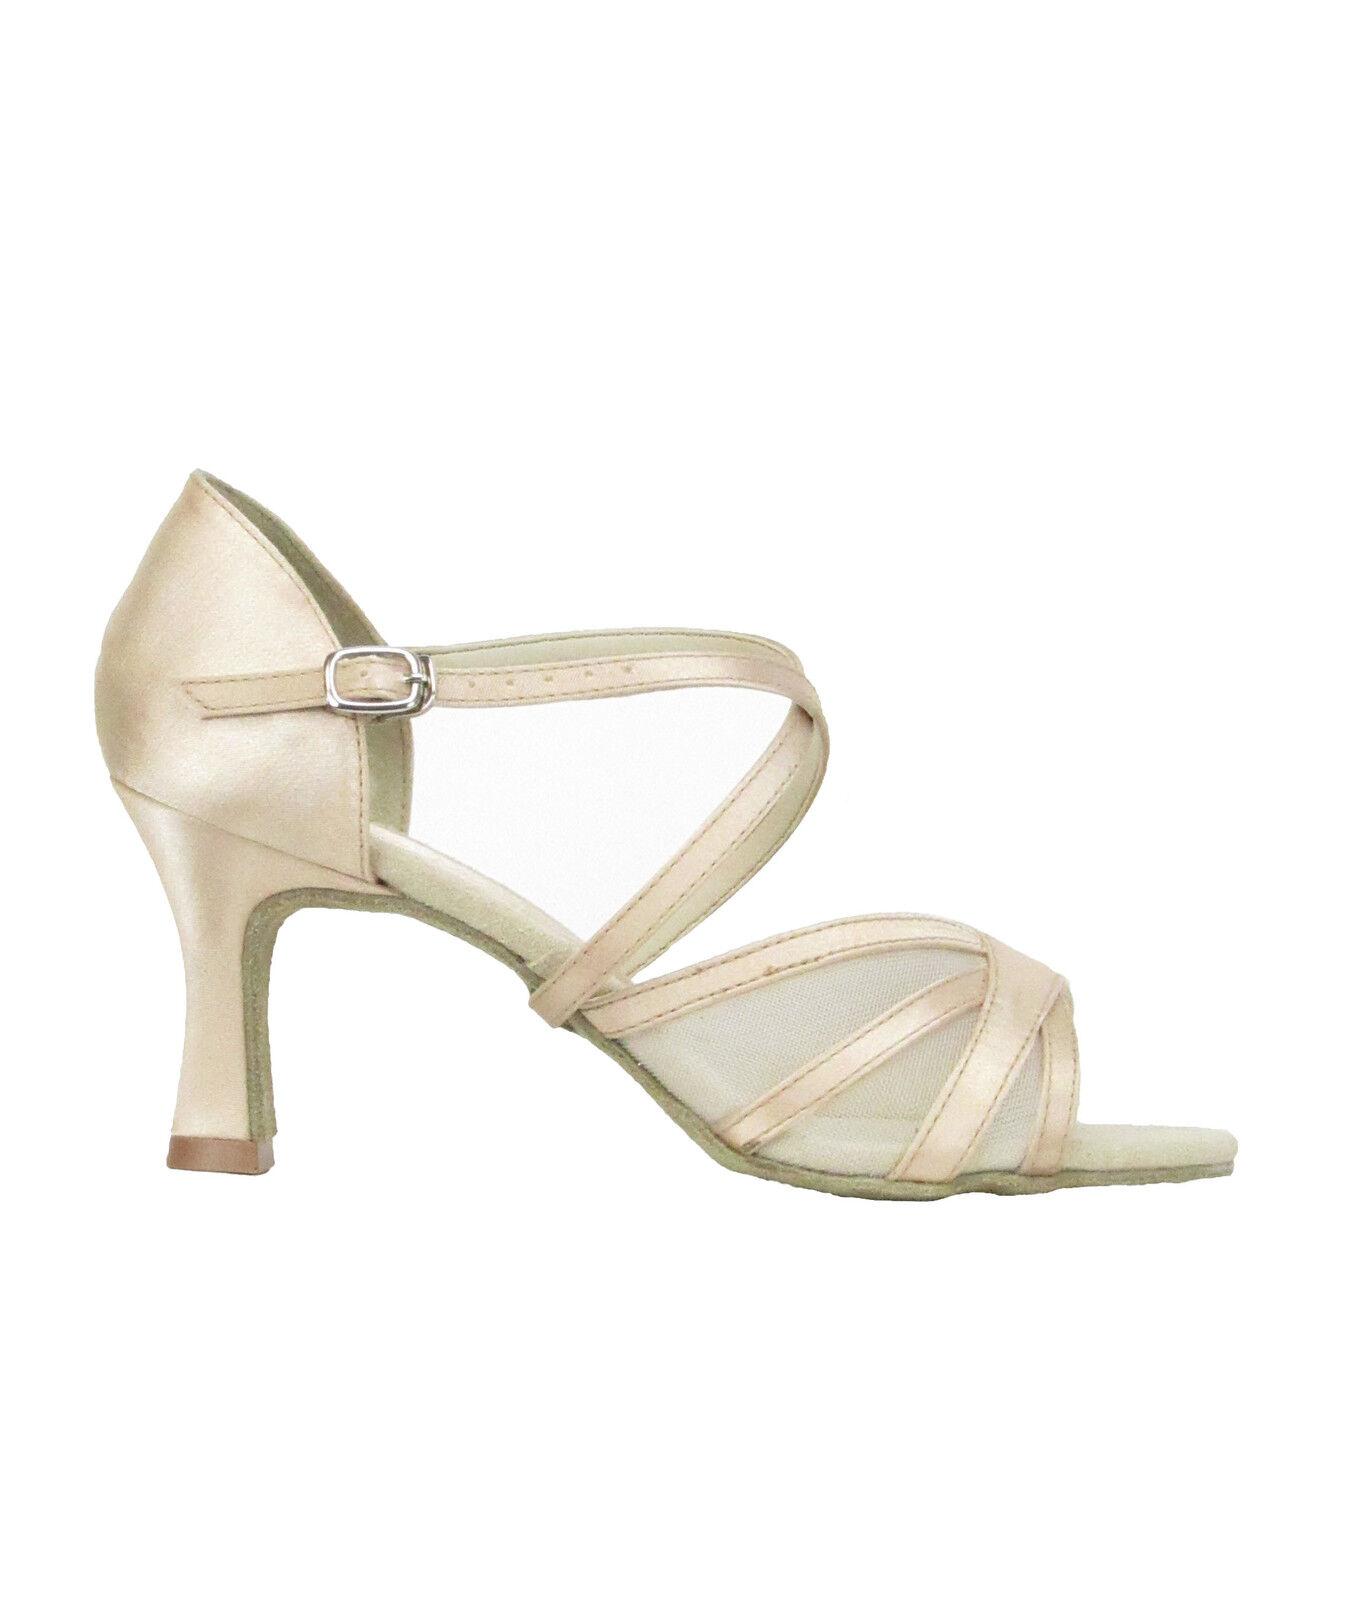 So Danca BL162 Damen Tanz Tango Salsa Balboa Rumba Latein Schuhe ivory Abs. 6,4